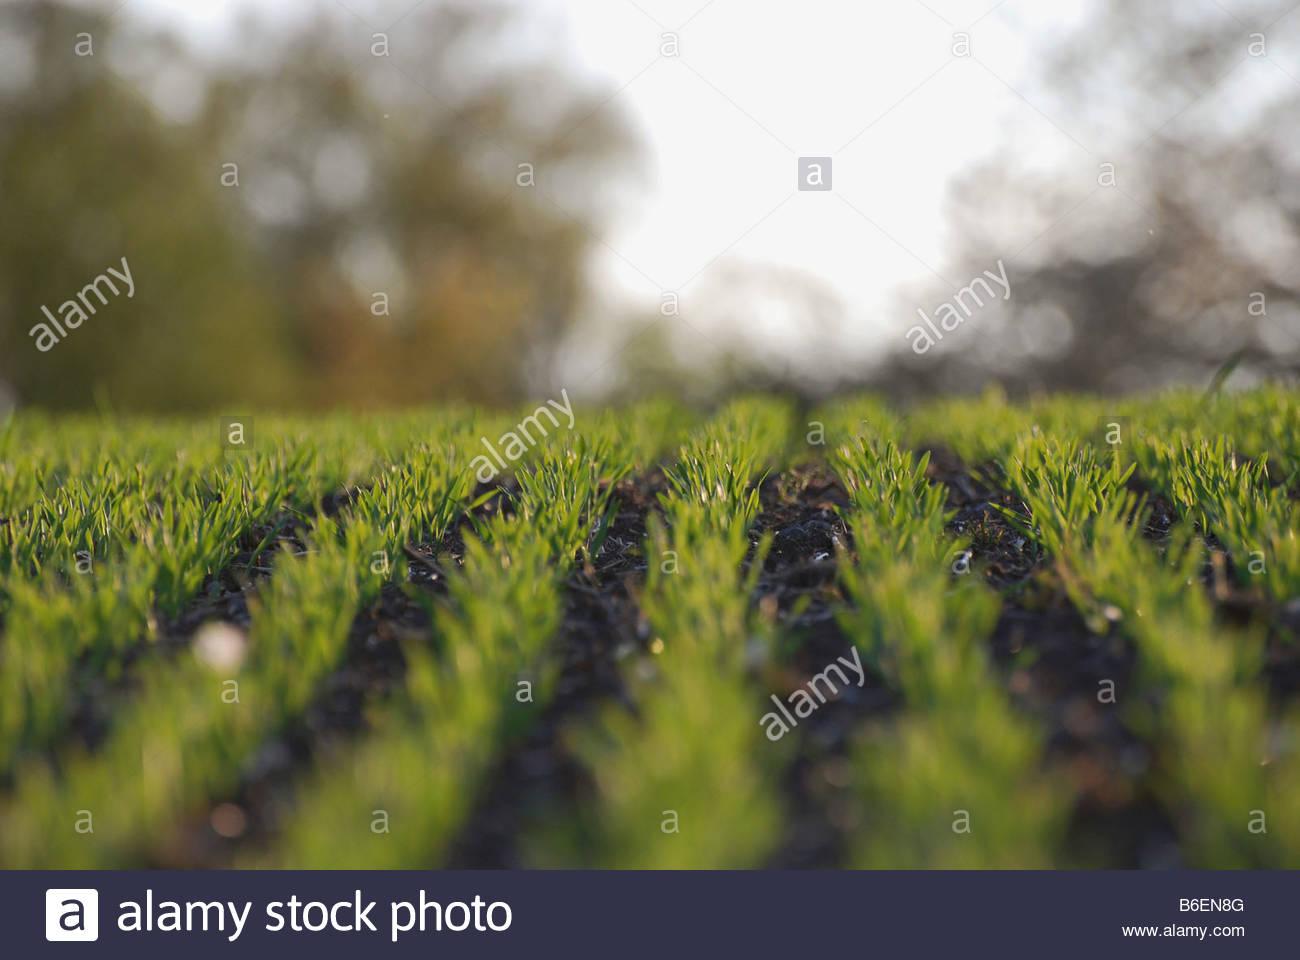 Rows of corn - Stock Image